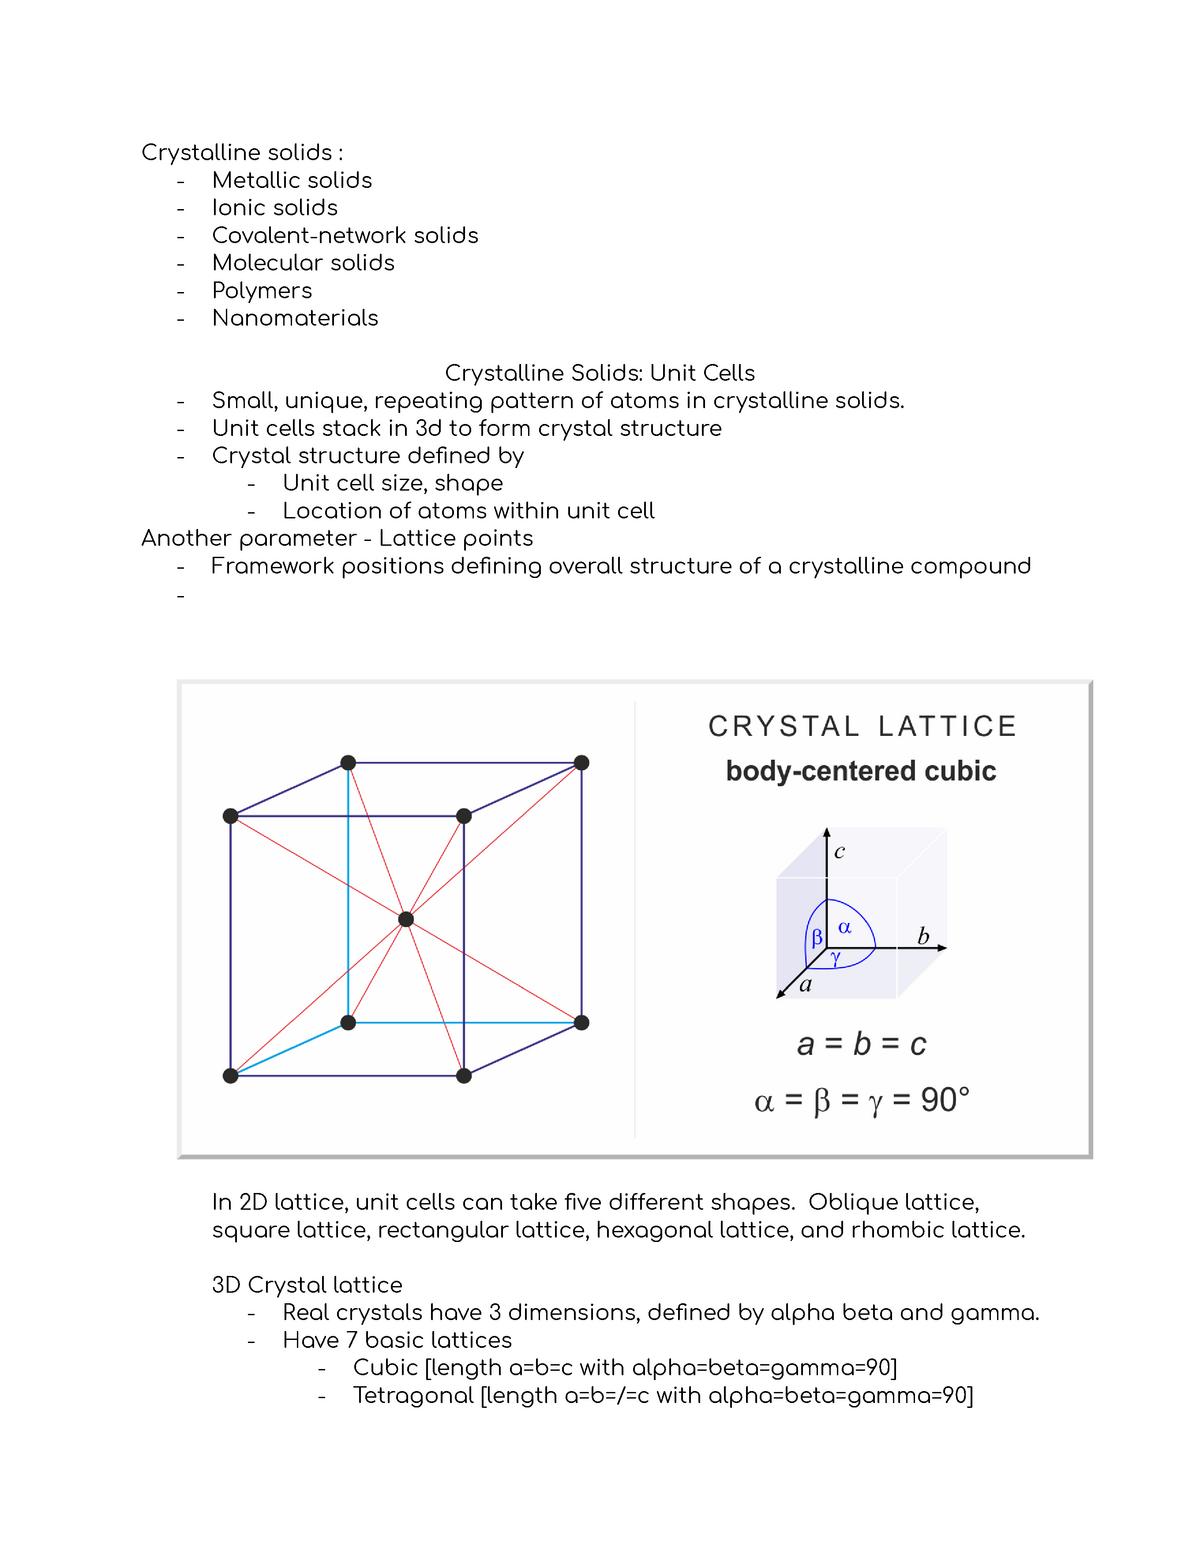 9 6 2018 - Donat - CHEM 123N: Foundations Of Chem Ii Lecture - StuDocu